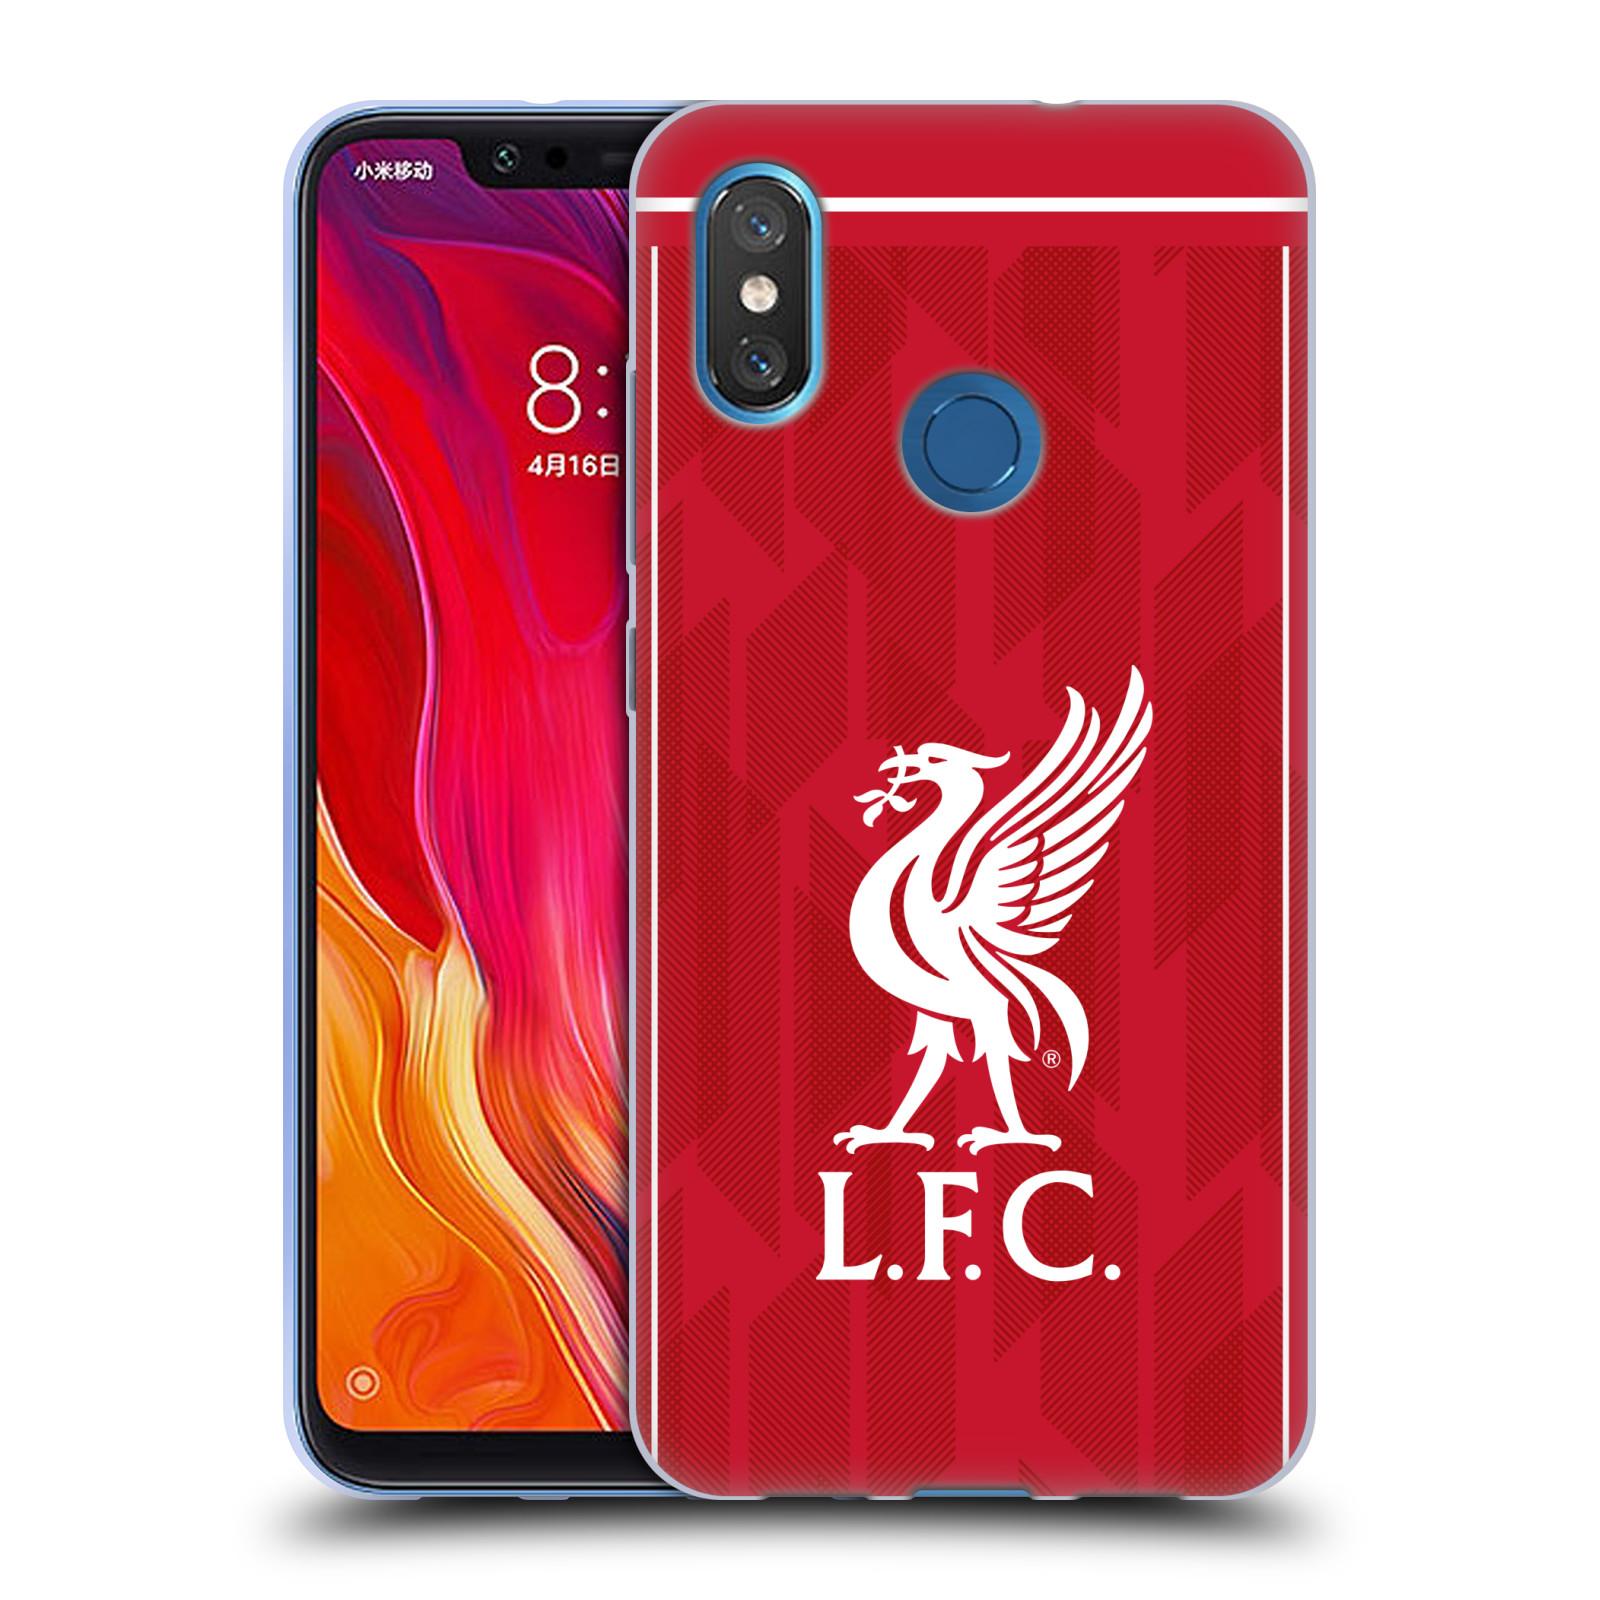 Silikonové pouzdro na mobil Xiaomi Mi8 - Head Case - Liverpool FC - L.F.C. Home kit